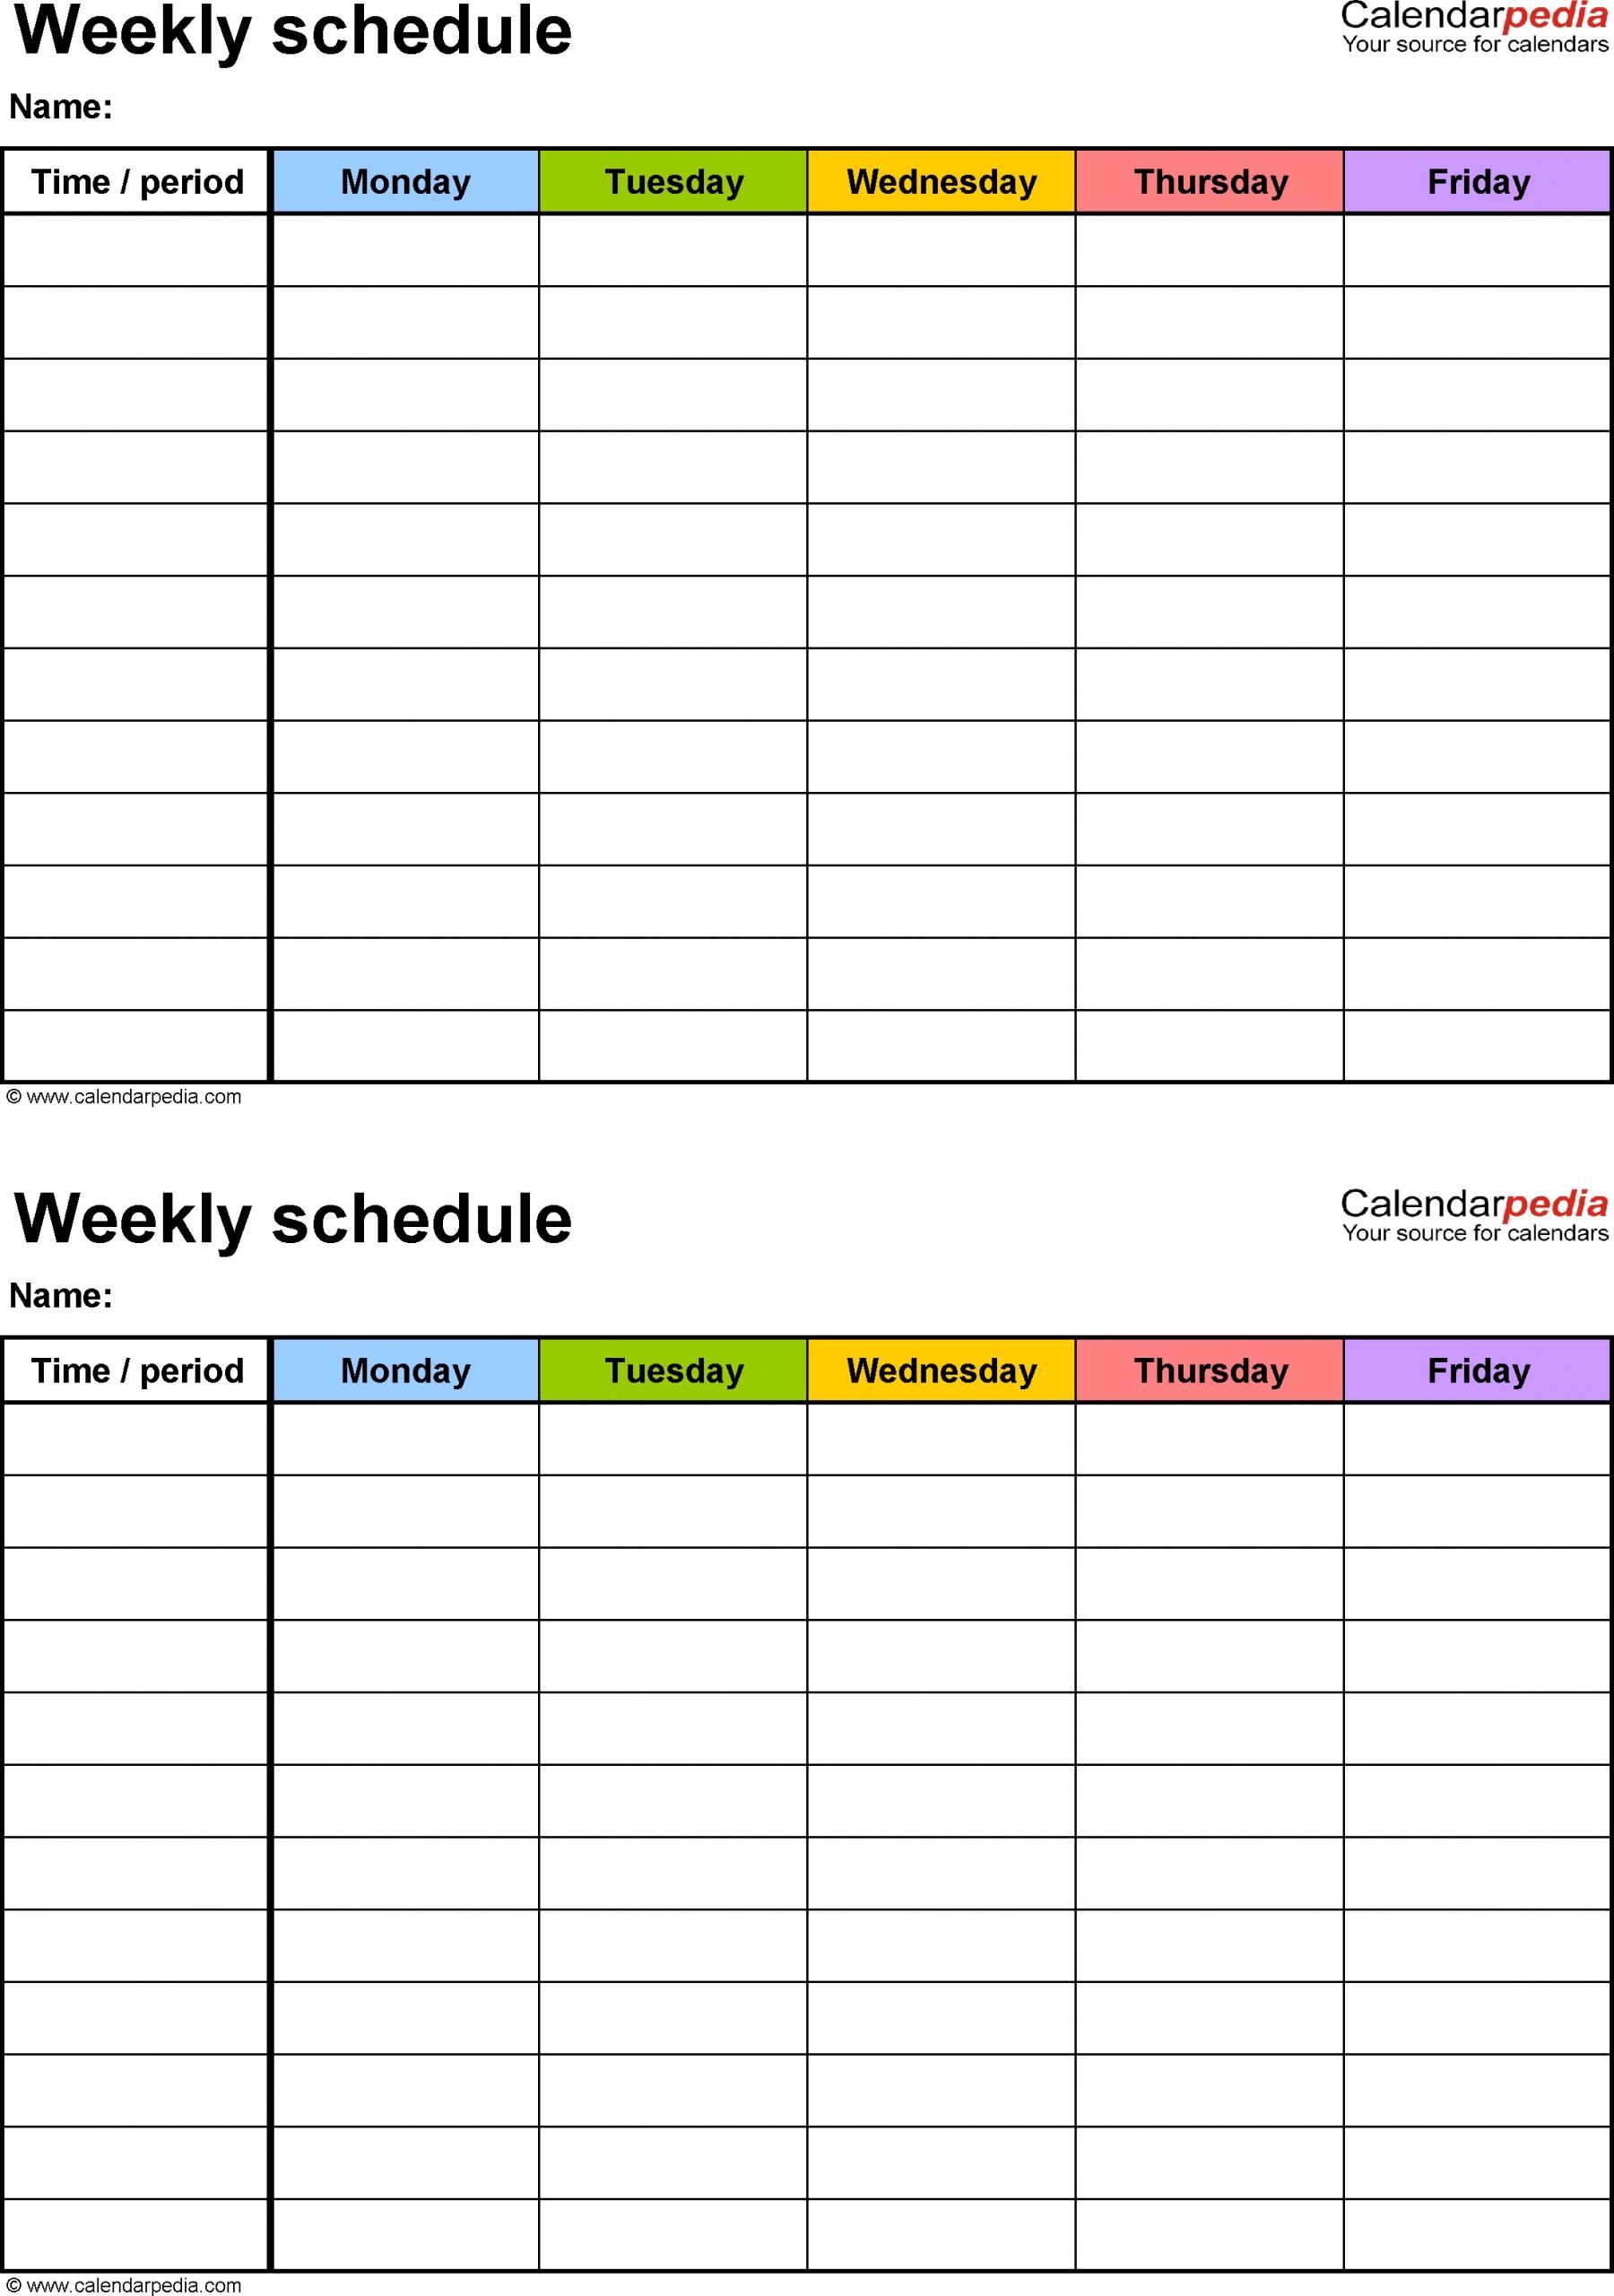 Printable Weekly Schedule Monday Thru Friday - Calendar Monday Thru Friday Printable Calendar Free